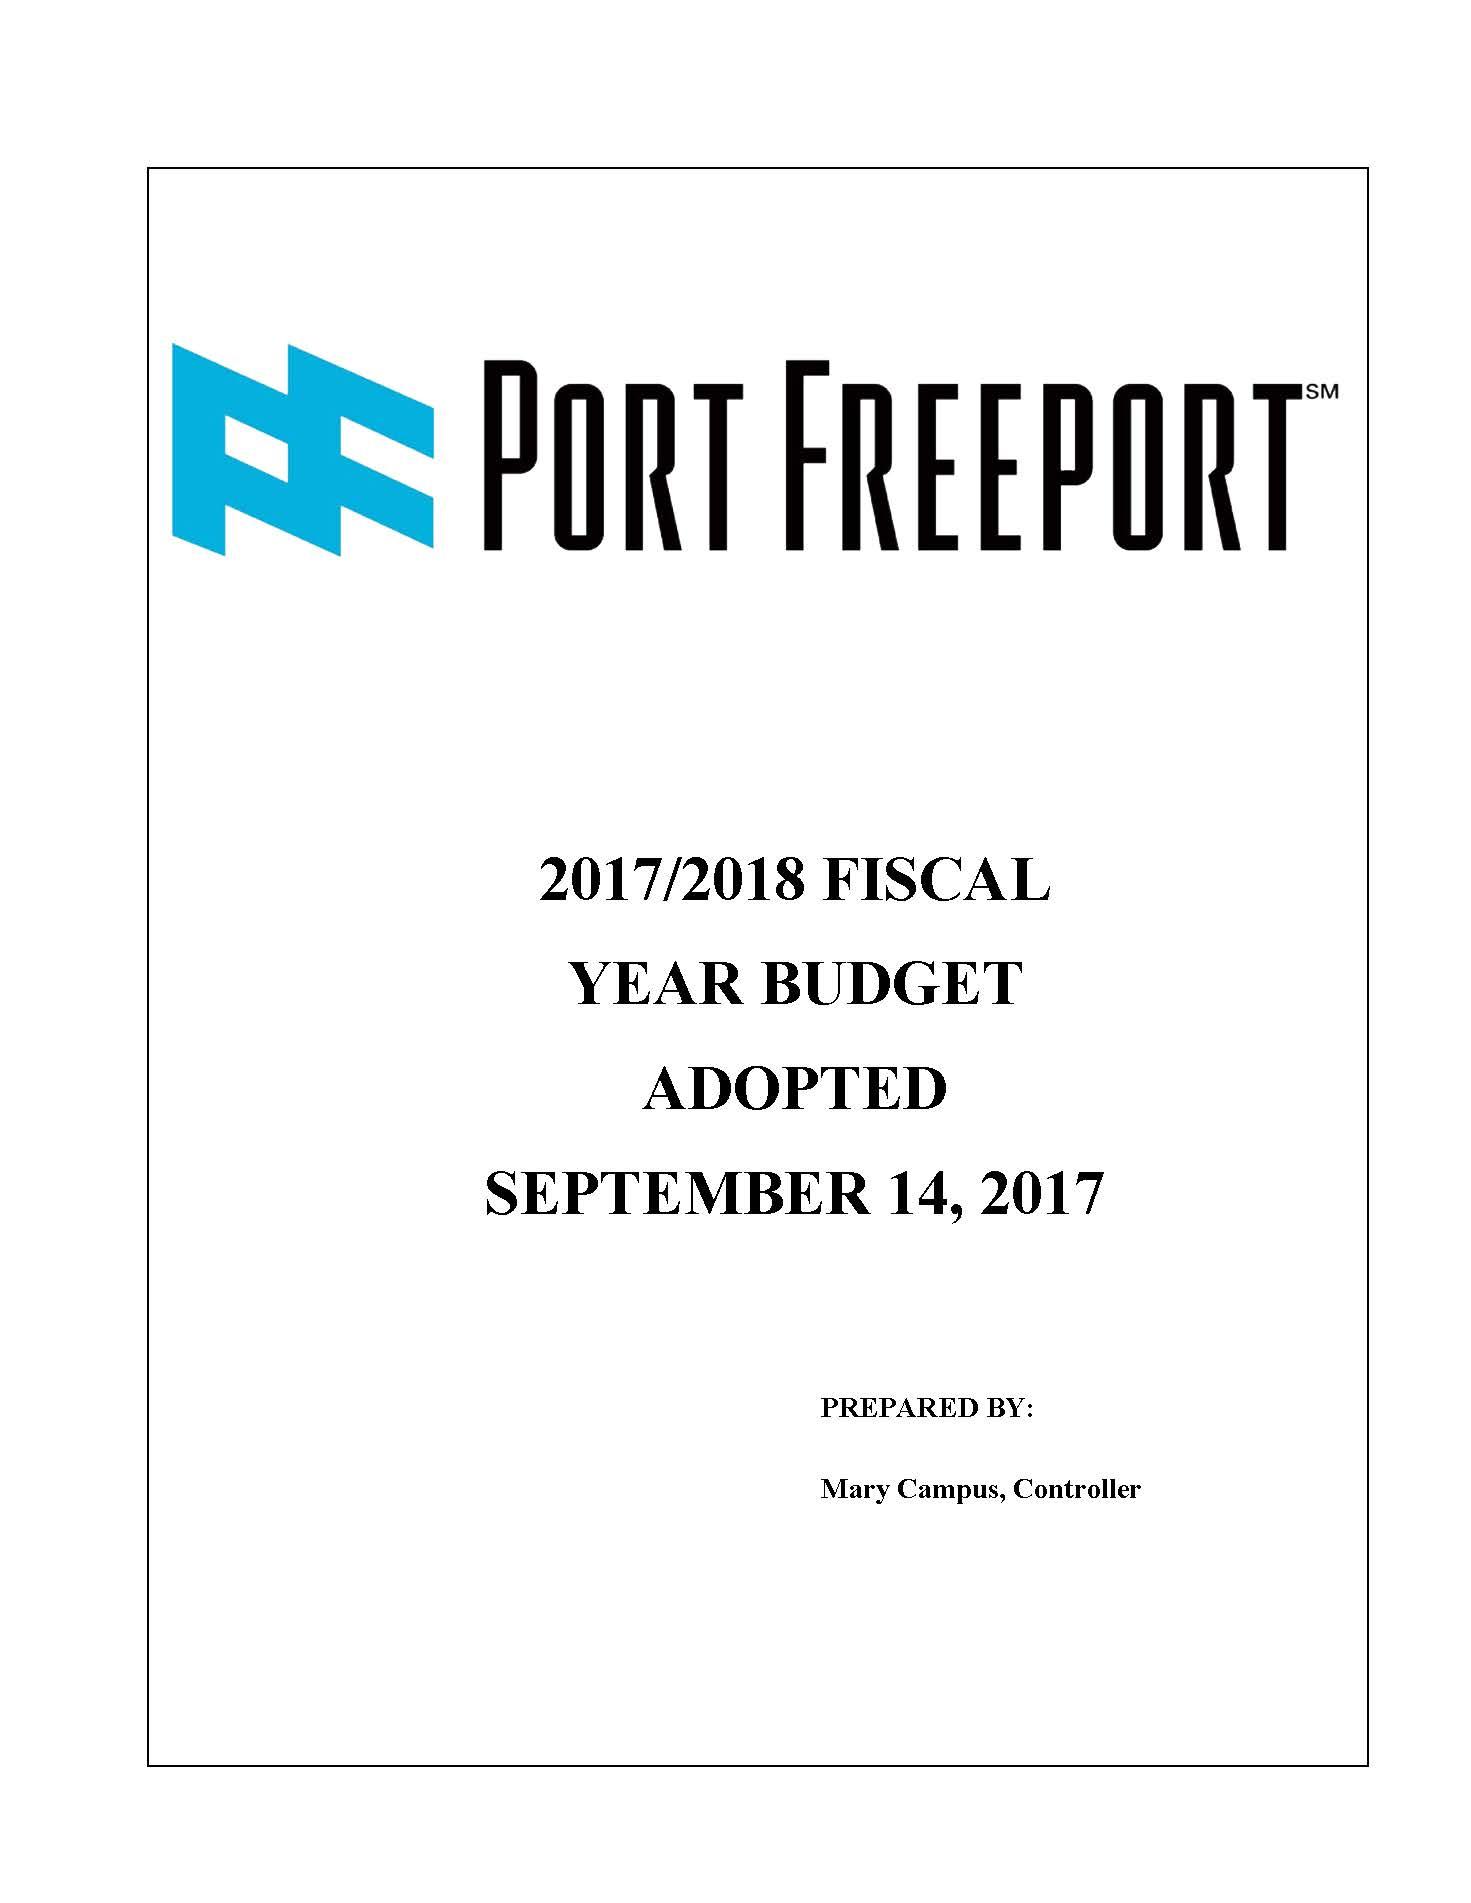 2017-2018 Budget Cover